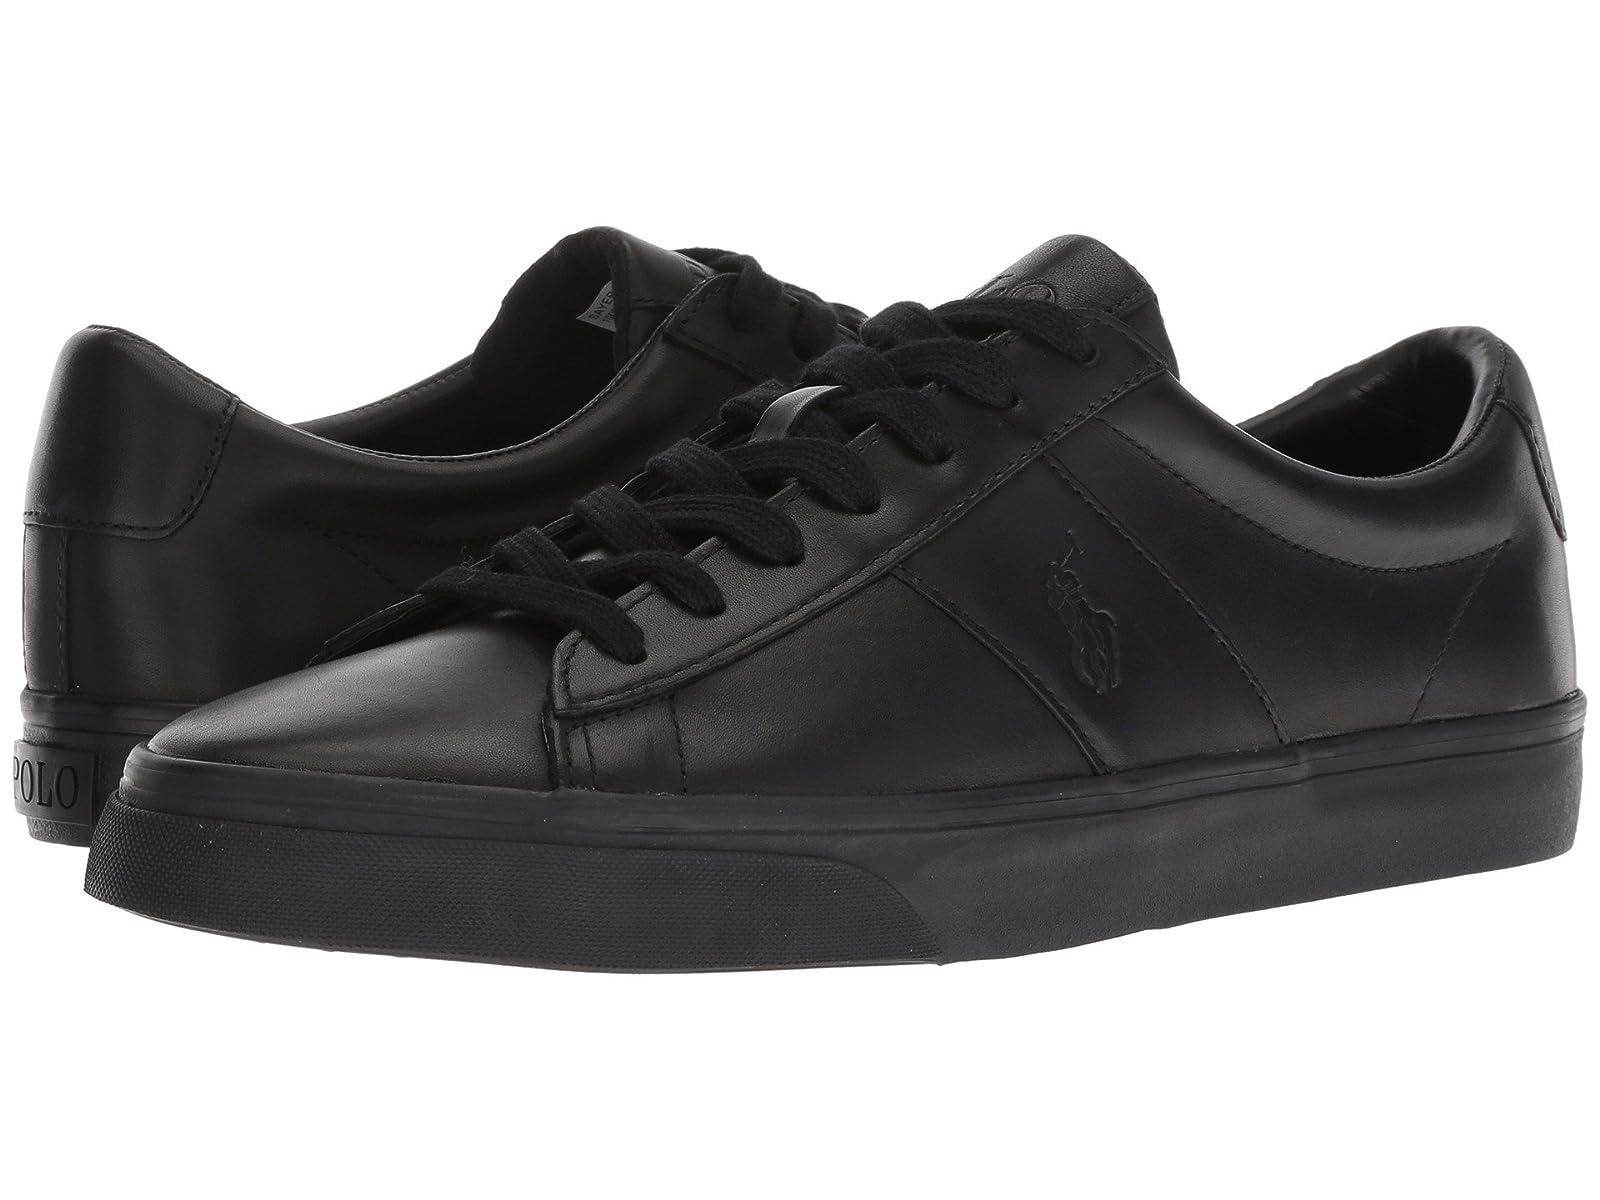 Polo Ralph Lauren SayerAtmospheric grades have affordable shoes